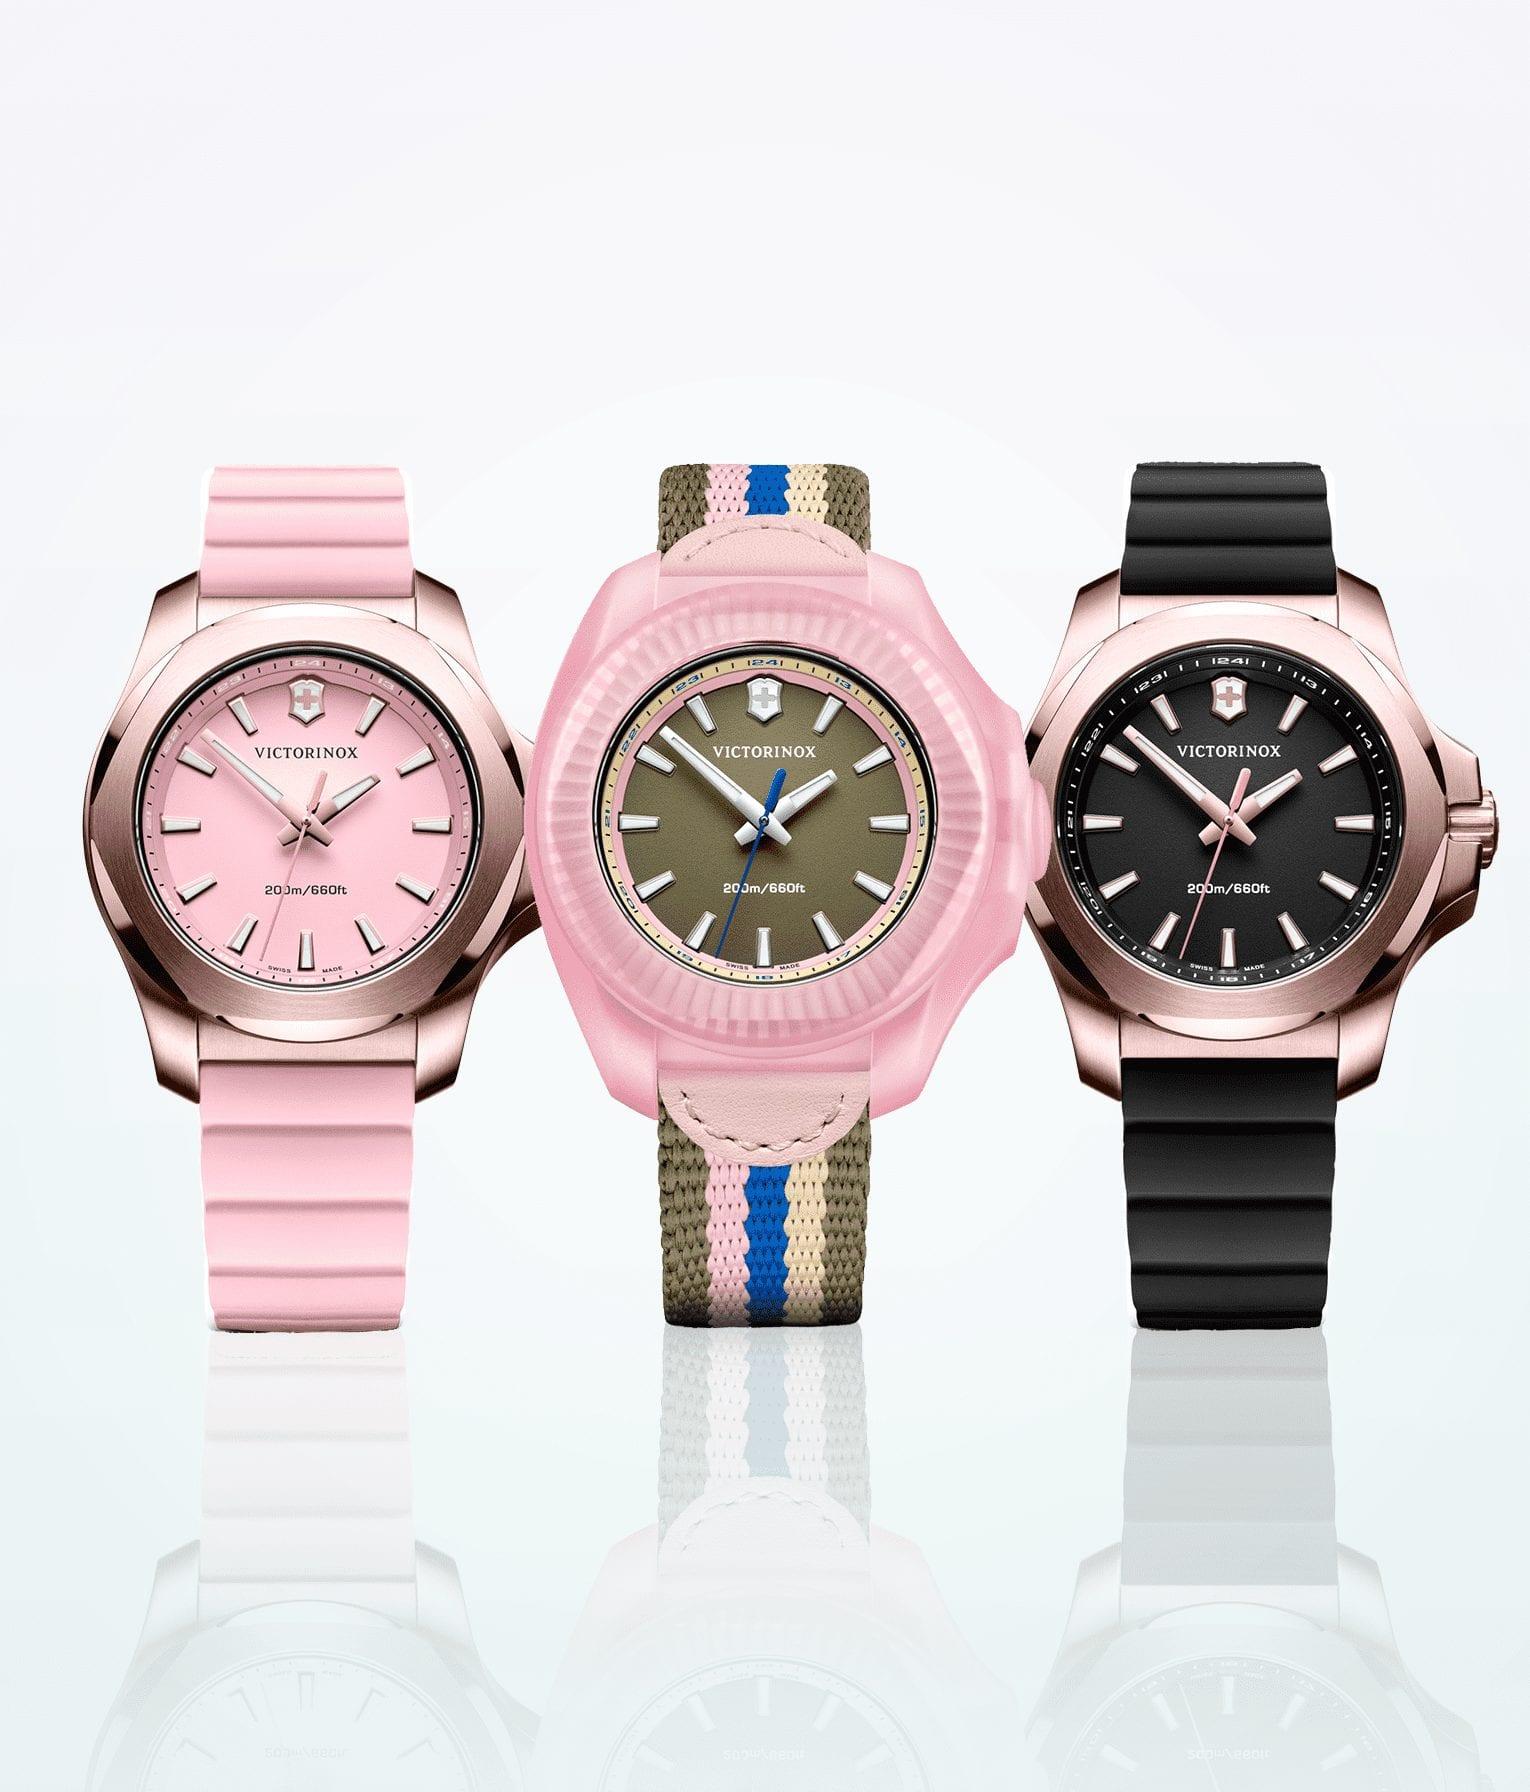 victorinox-inox-v-women-wristwatch